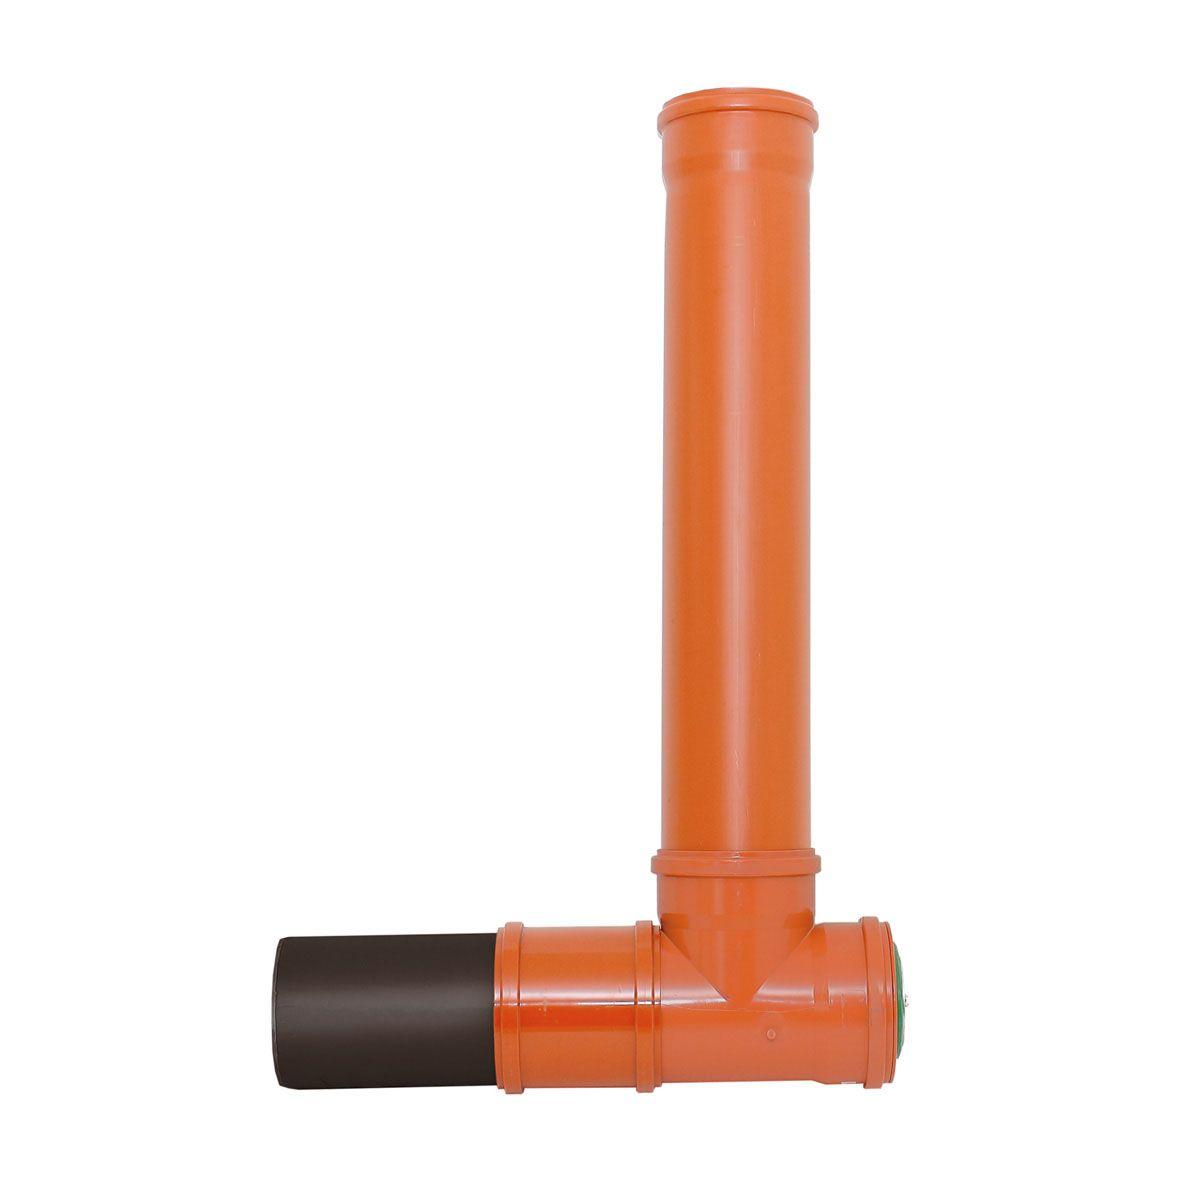 Drosselausbaupaket 1, aus PVC/PE, DN 200, 1.0 / 2.0 / 5.0 / 6.5 l/sec.